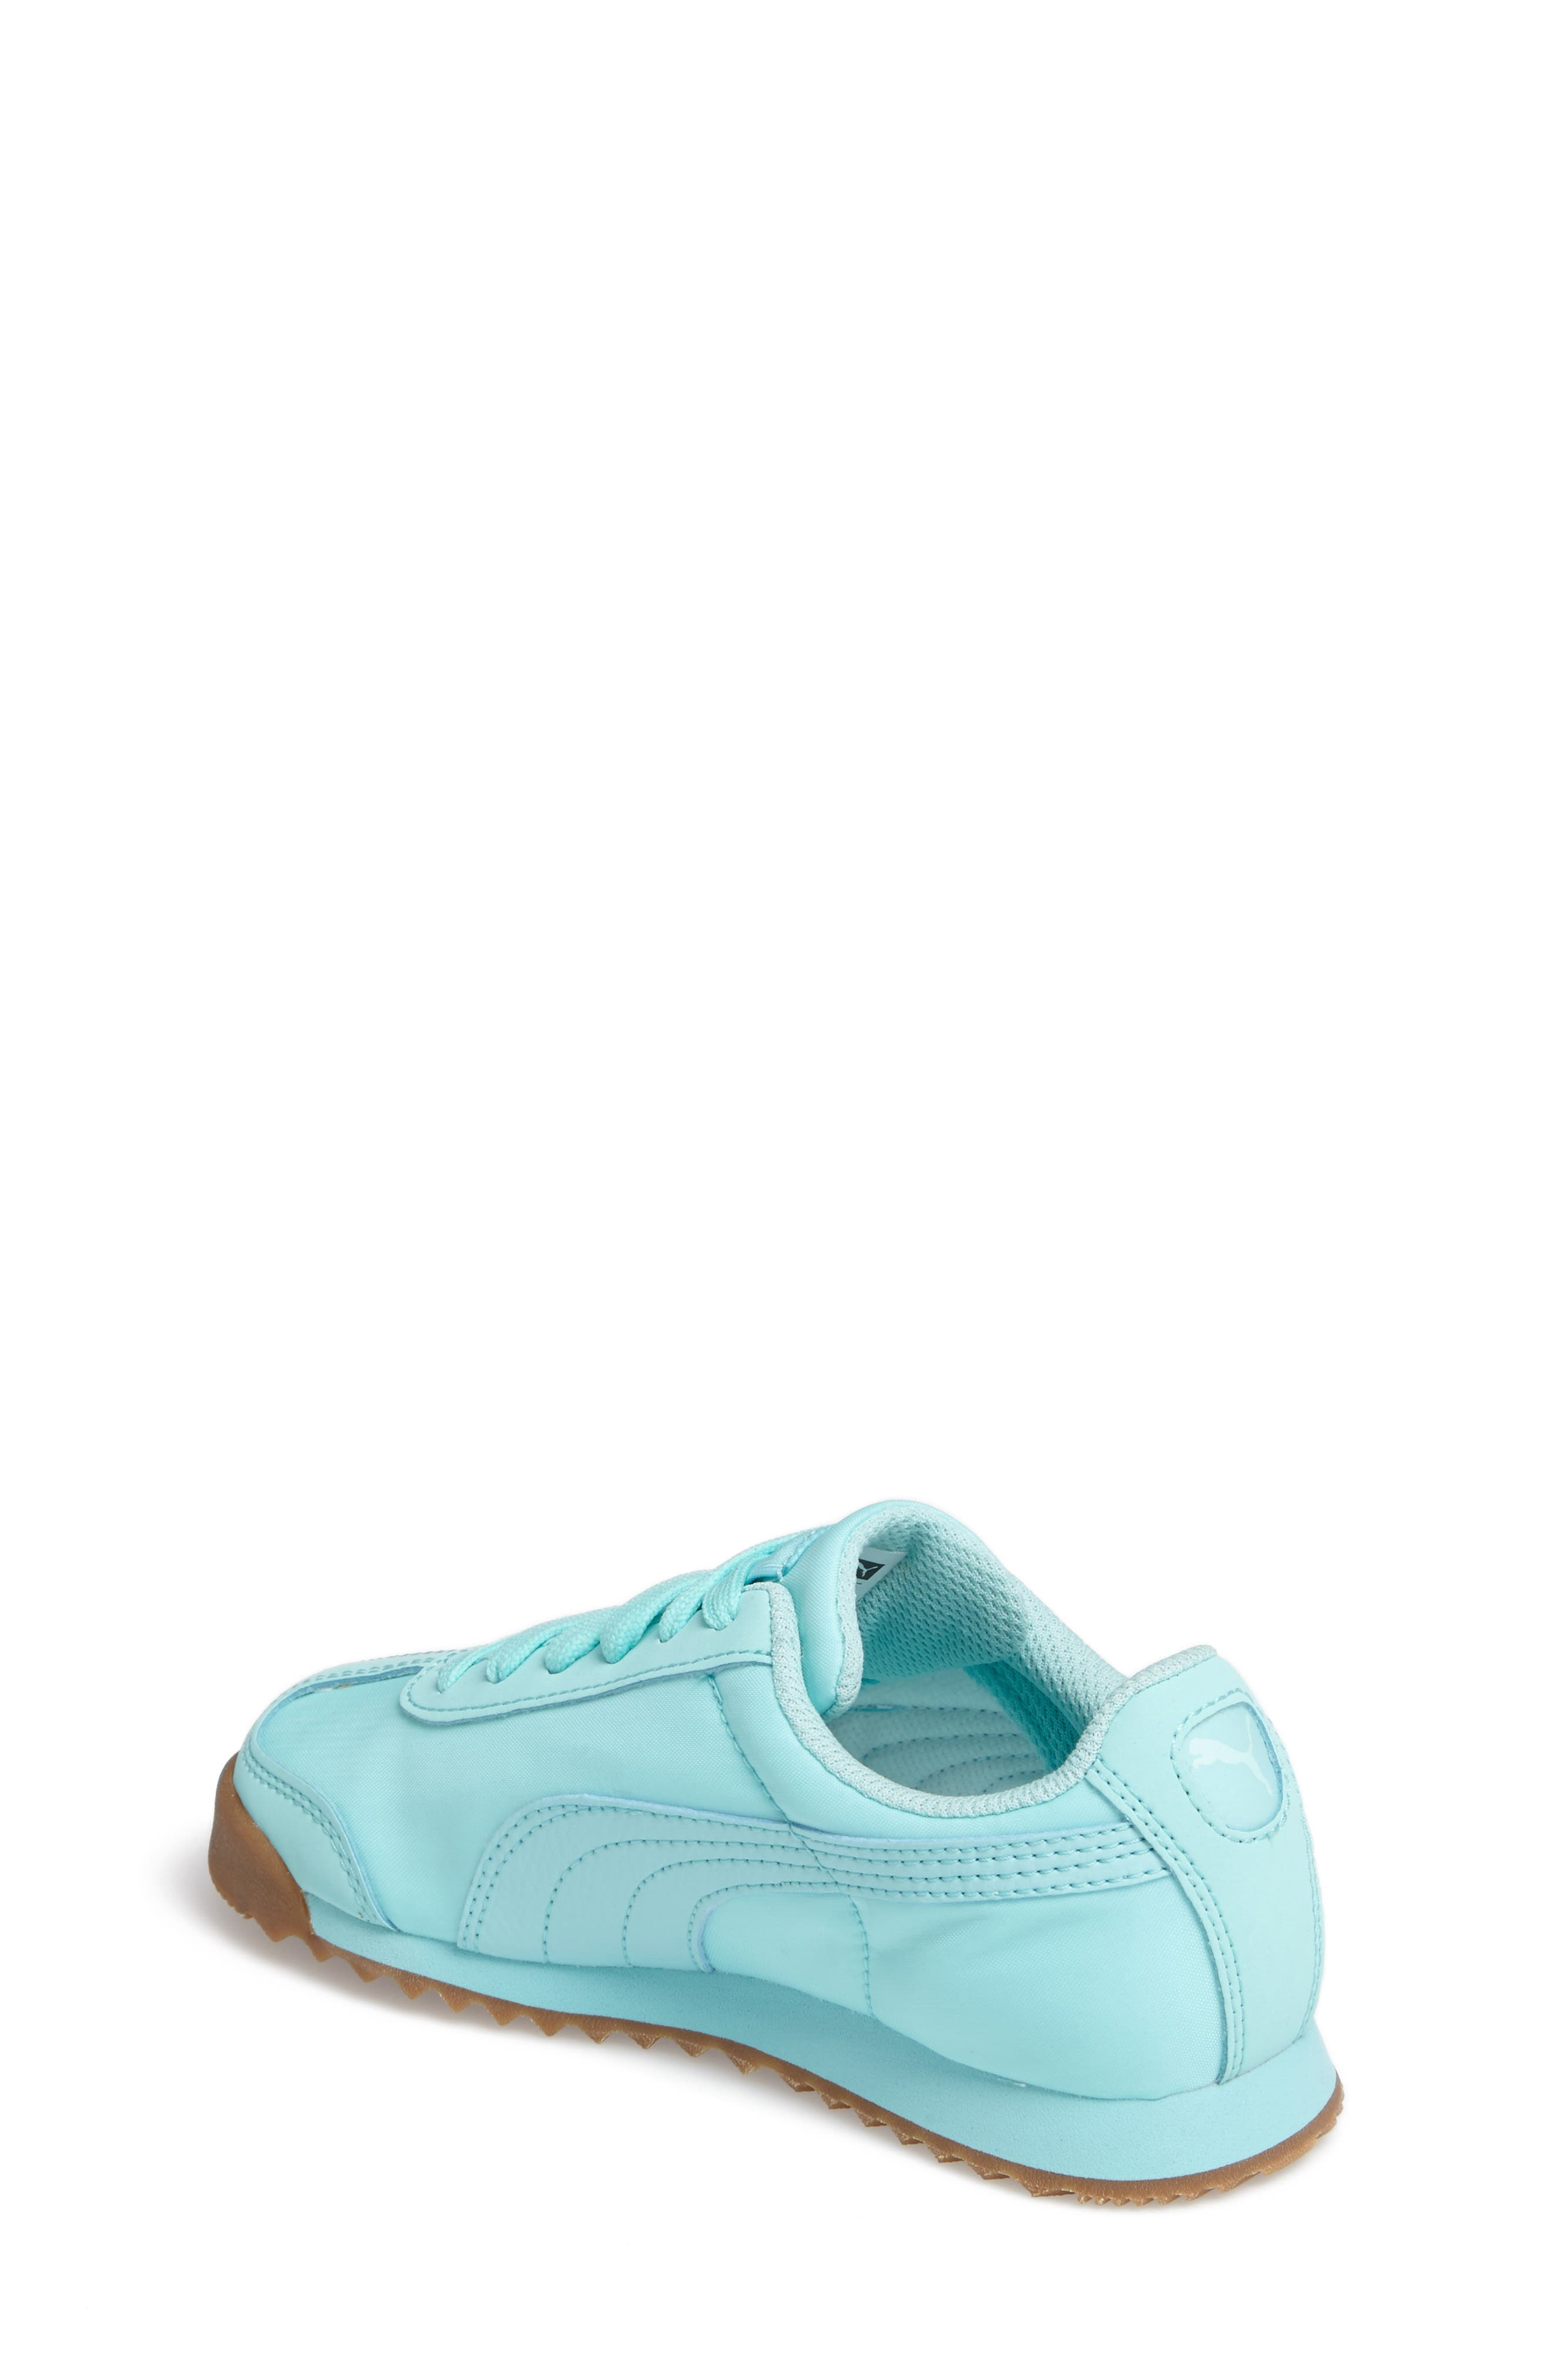 Roma Basic Summer Sneaker,                             Alternate thumbnail 2, color,                             Aruba Blue